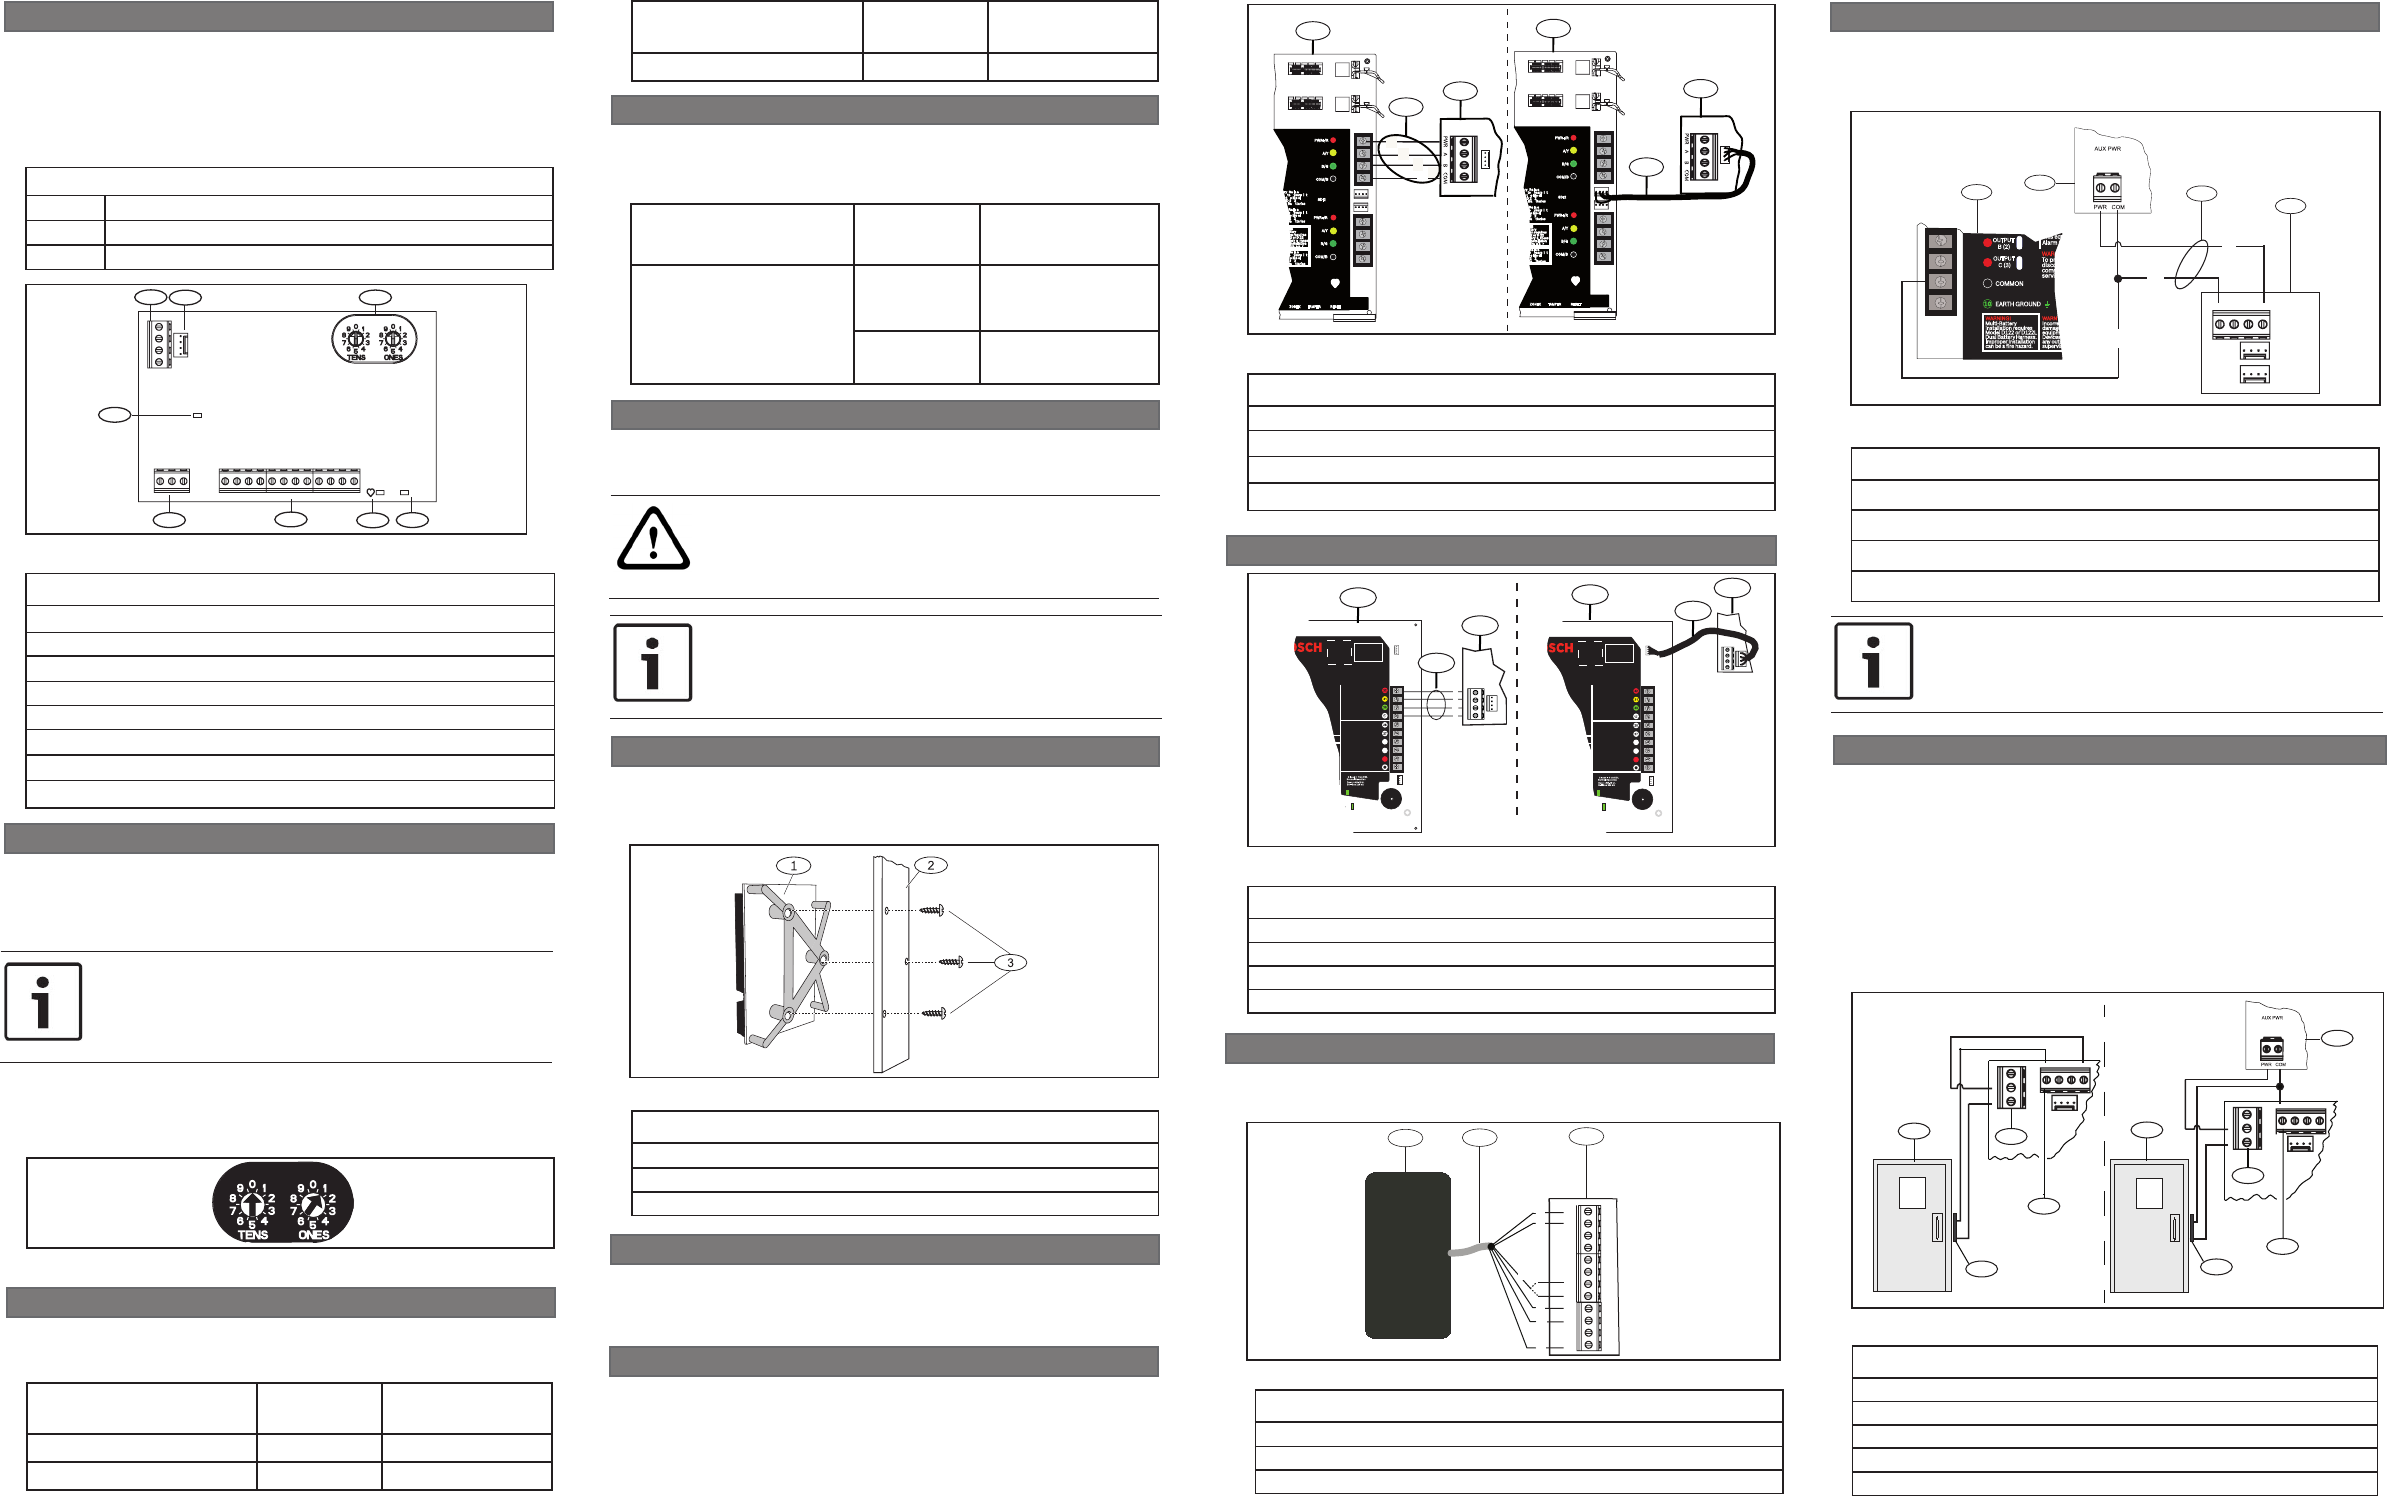 Bosch Installation Manual B901 In Guide En US 18582745355